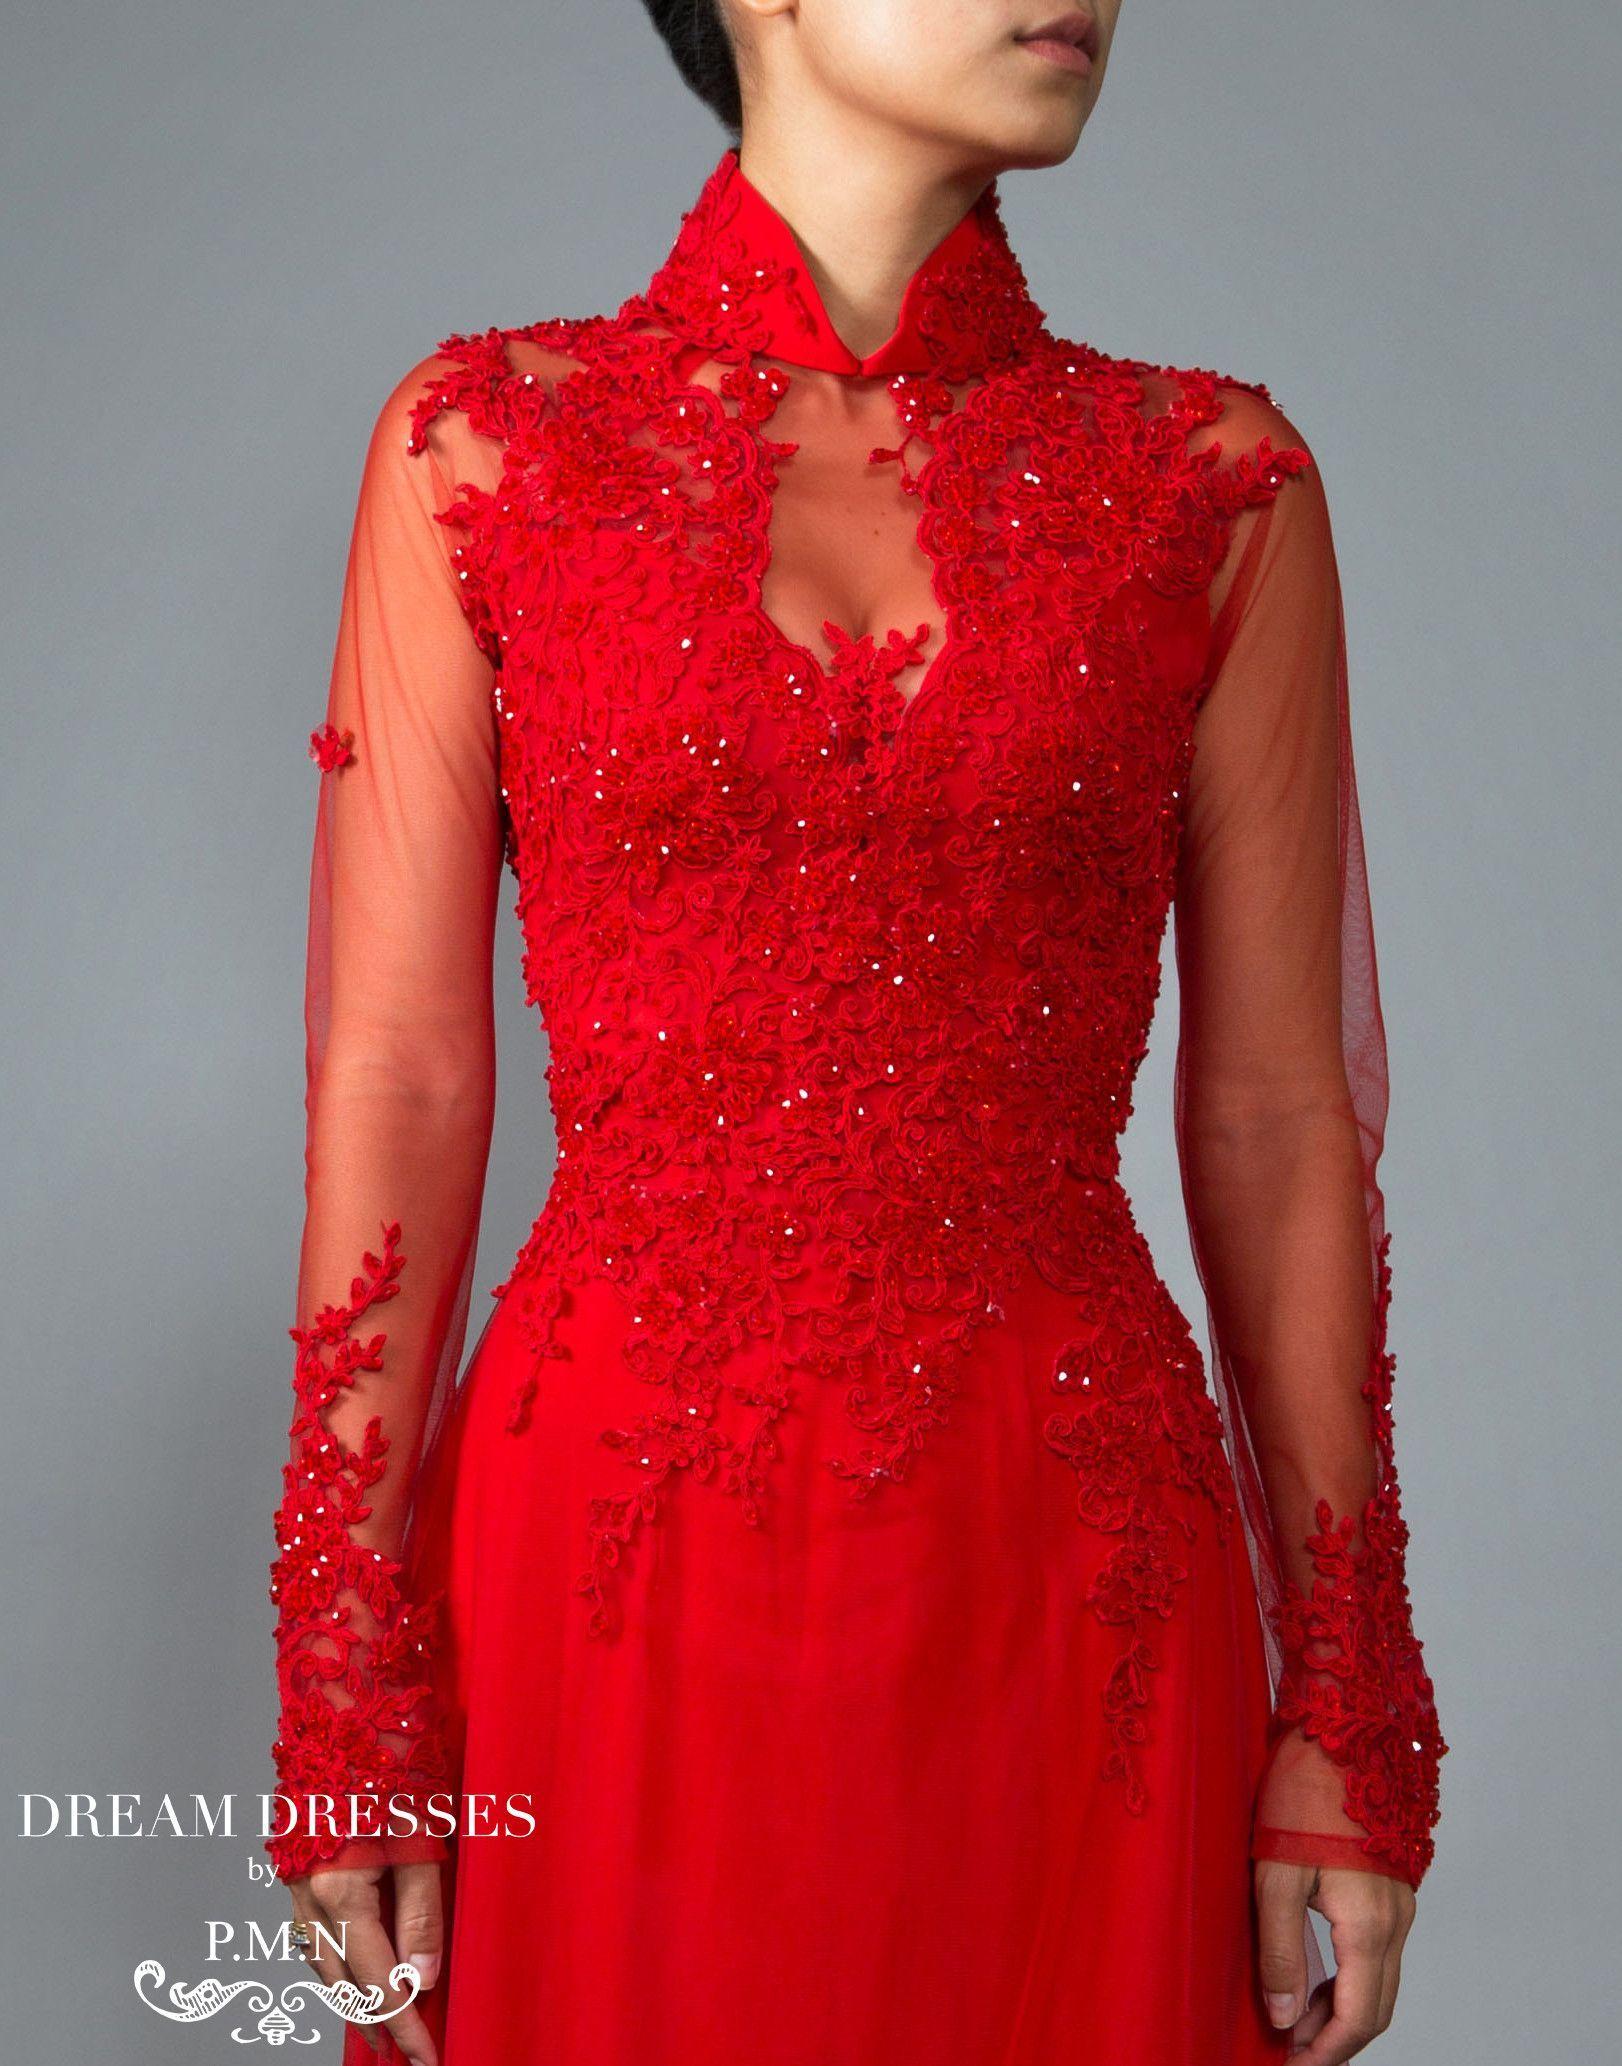 Red Ao Dai Vietnamese Lace Bridal Dress (VIONA) in 2020